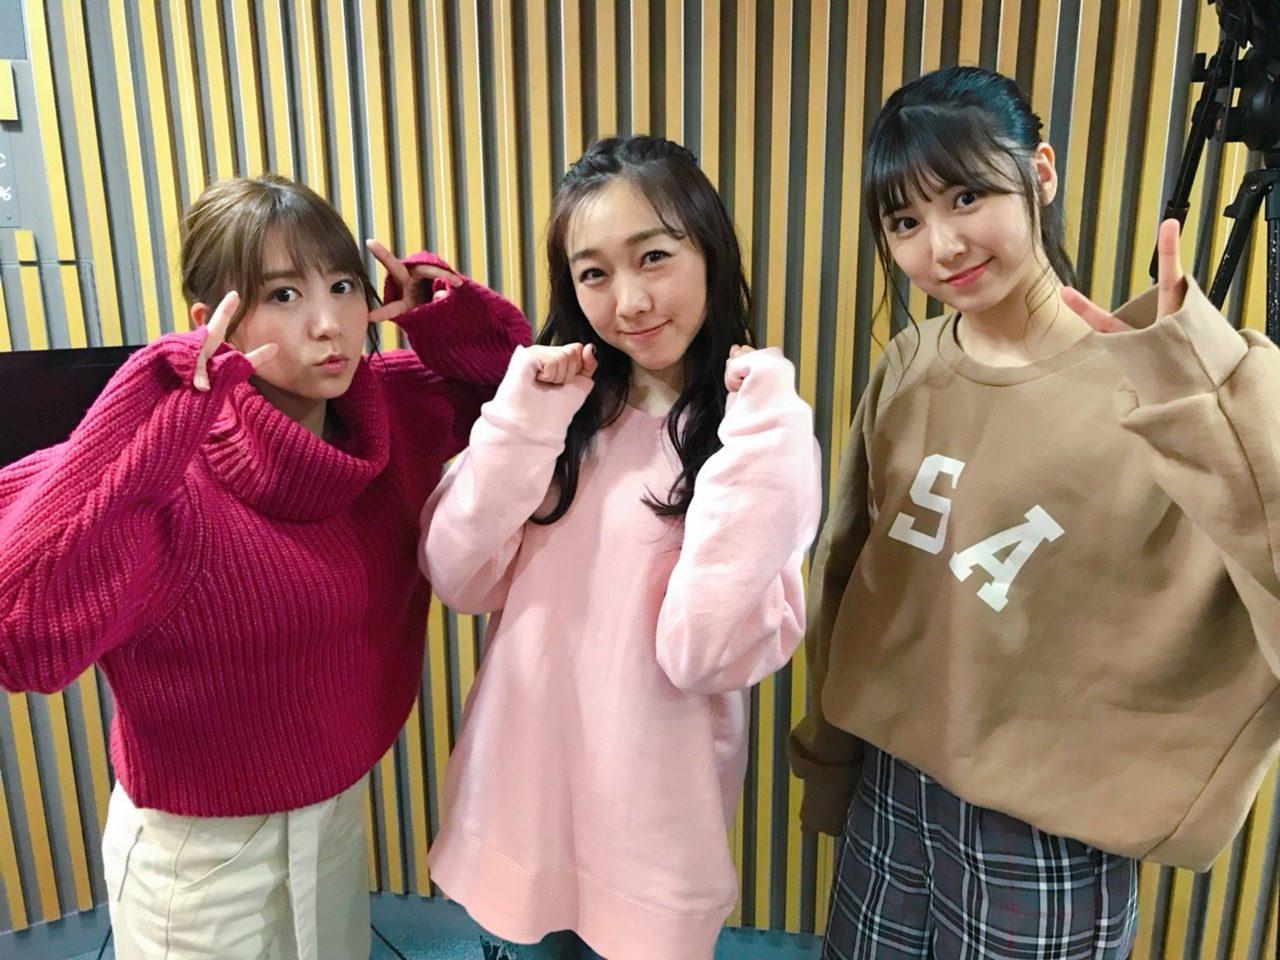 SKE48大場美奈・須田亜香里・菅原茉椰「SKE48のオールナイトニッポン」オフショット